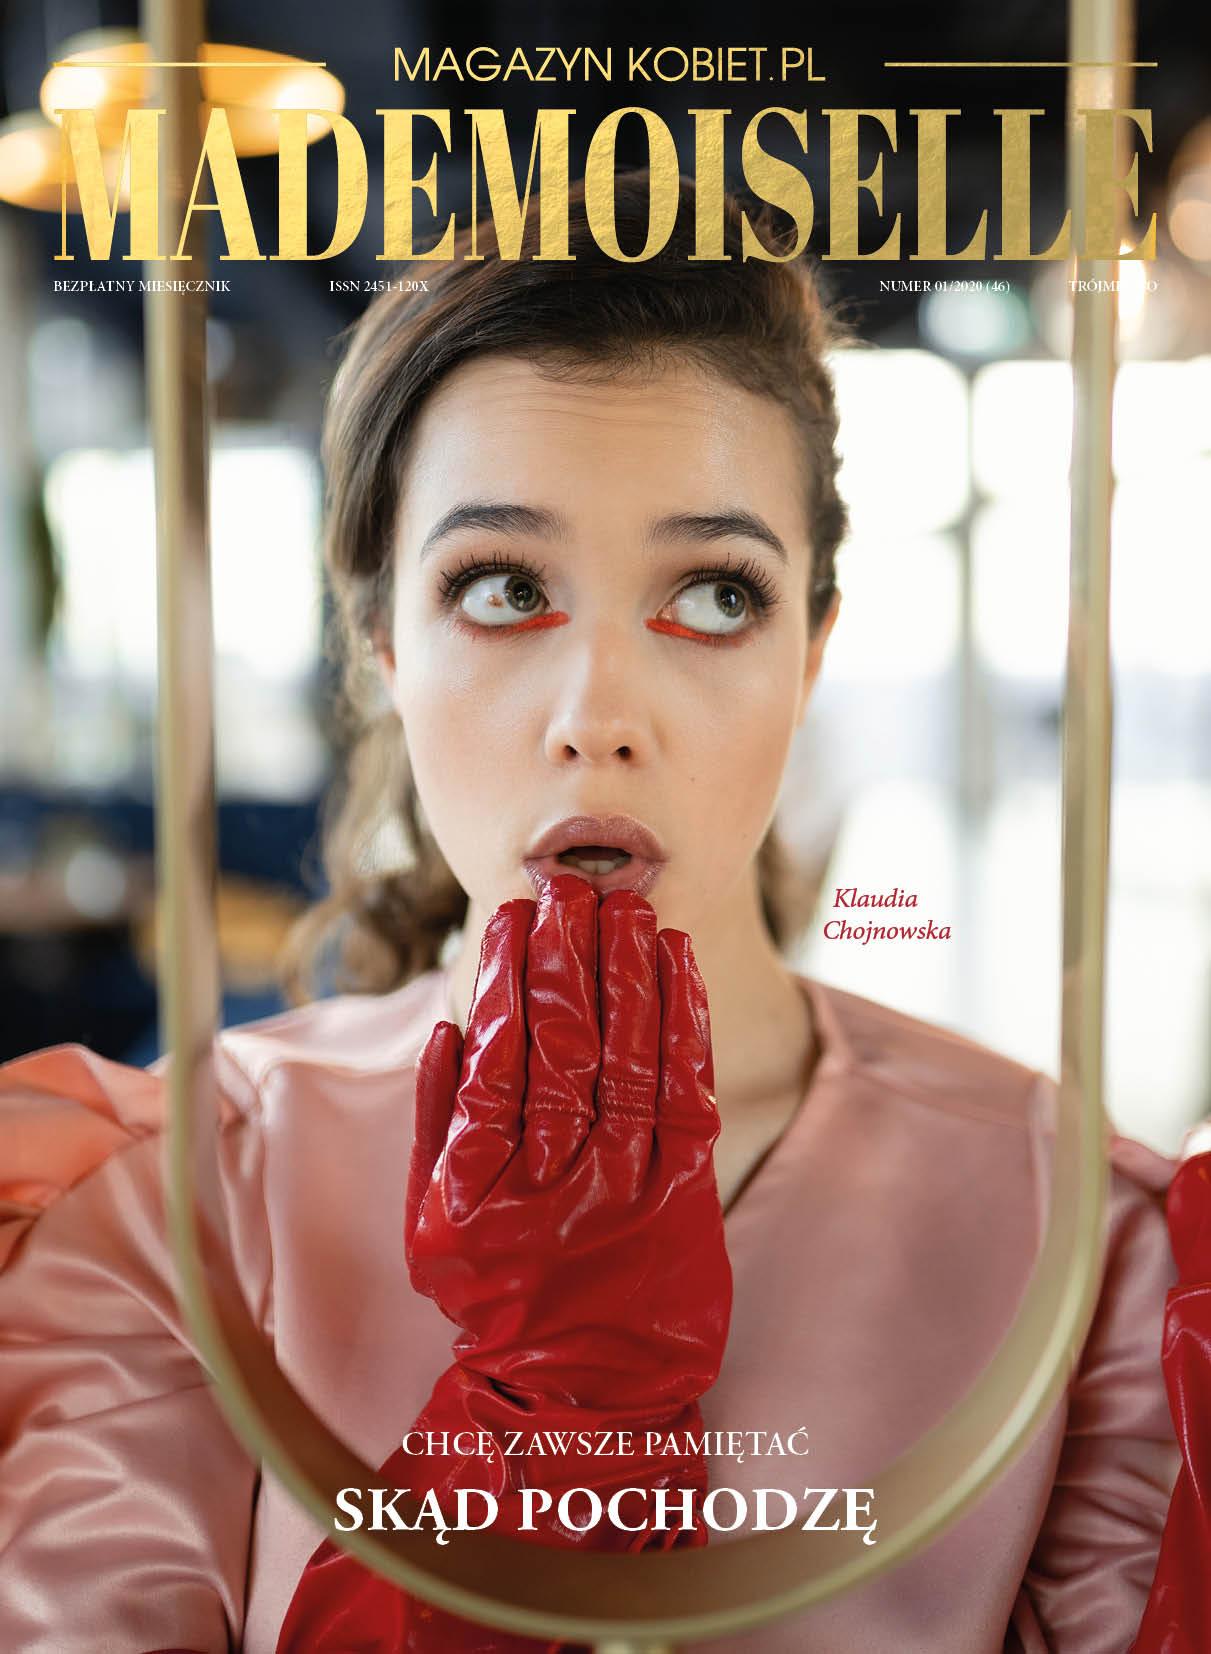 magazyn kobiet mademoiselle grudzień